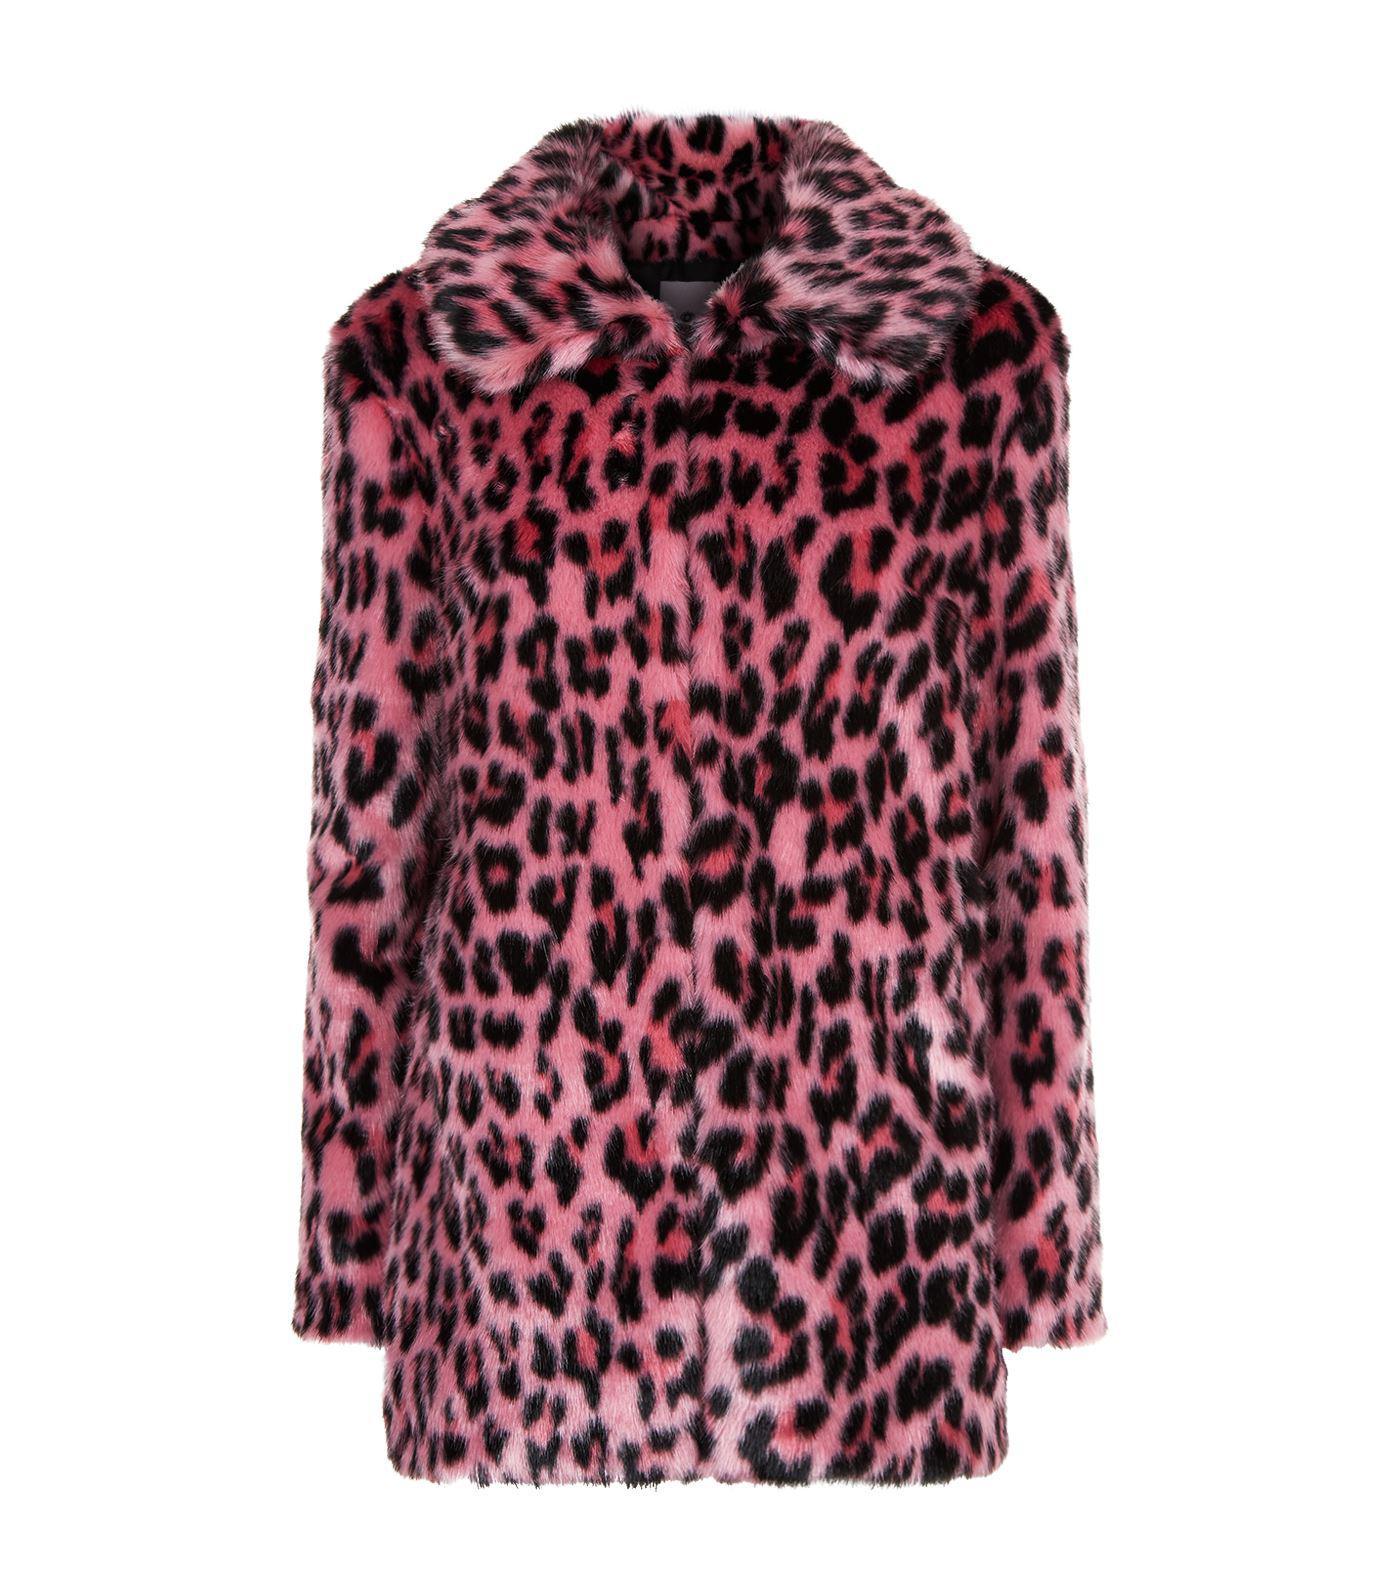 ebf20e7d00dc Pinko Leopard Print Faux Fur Pea Coat in Red - Lyst